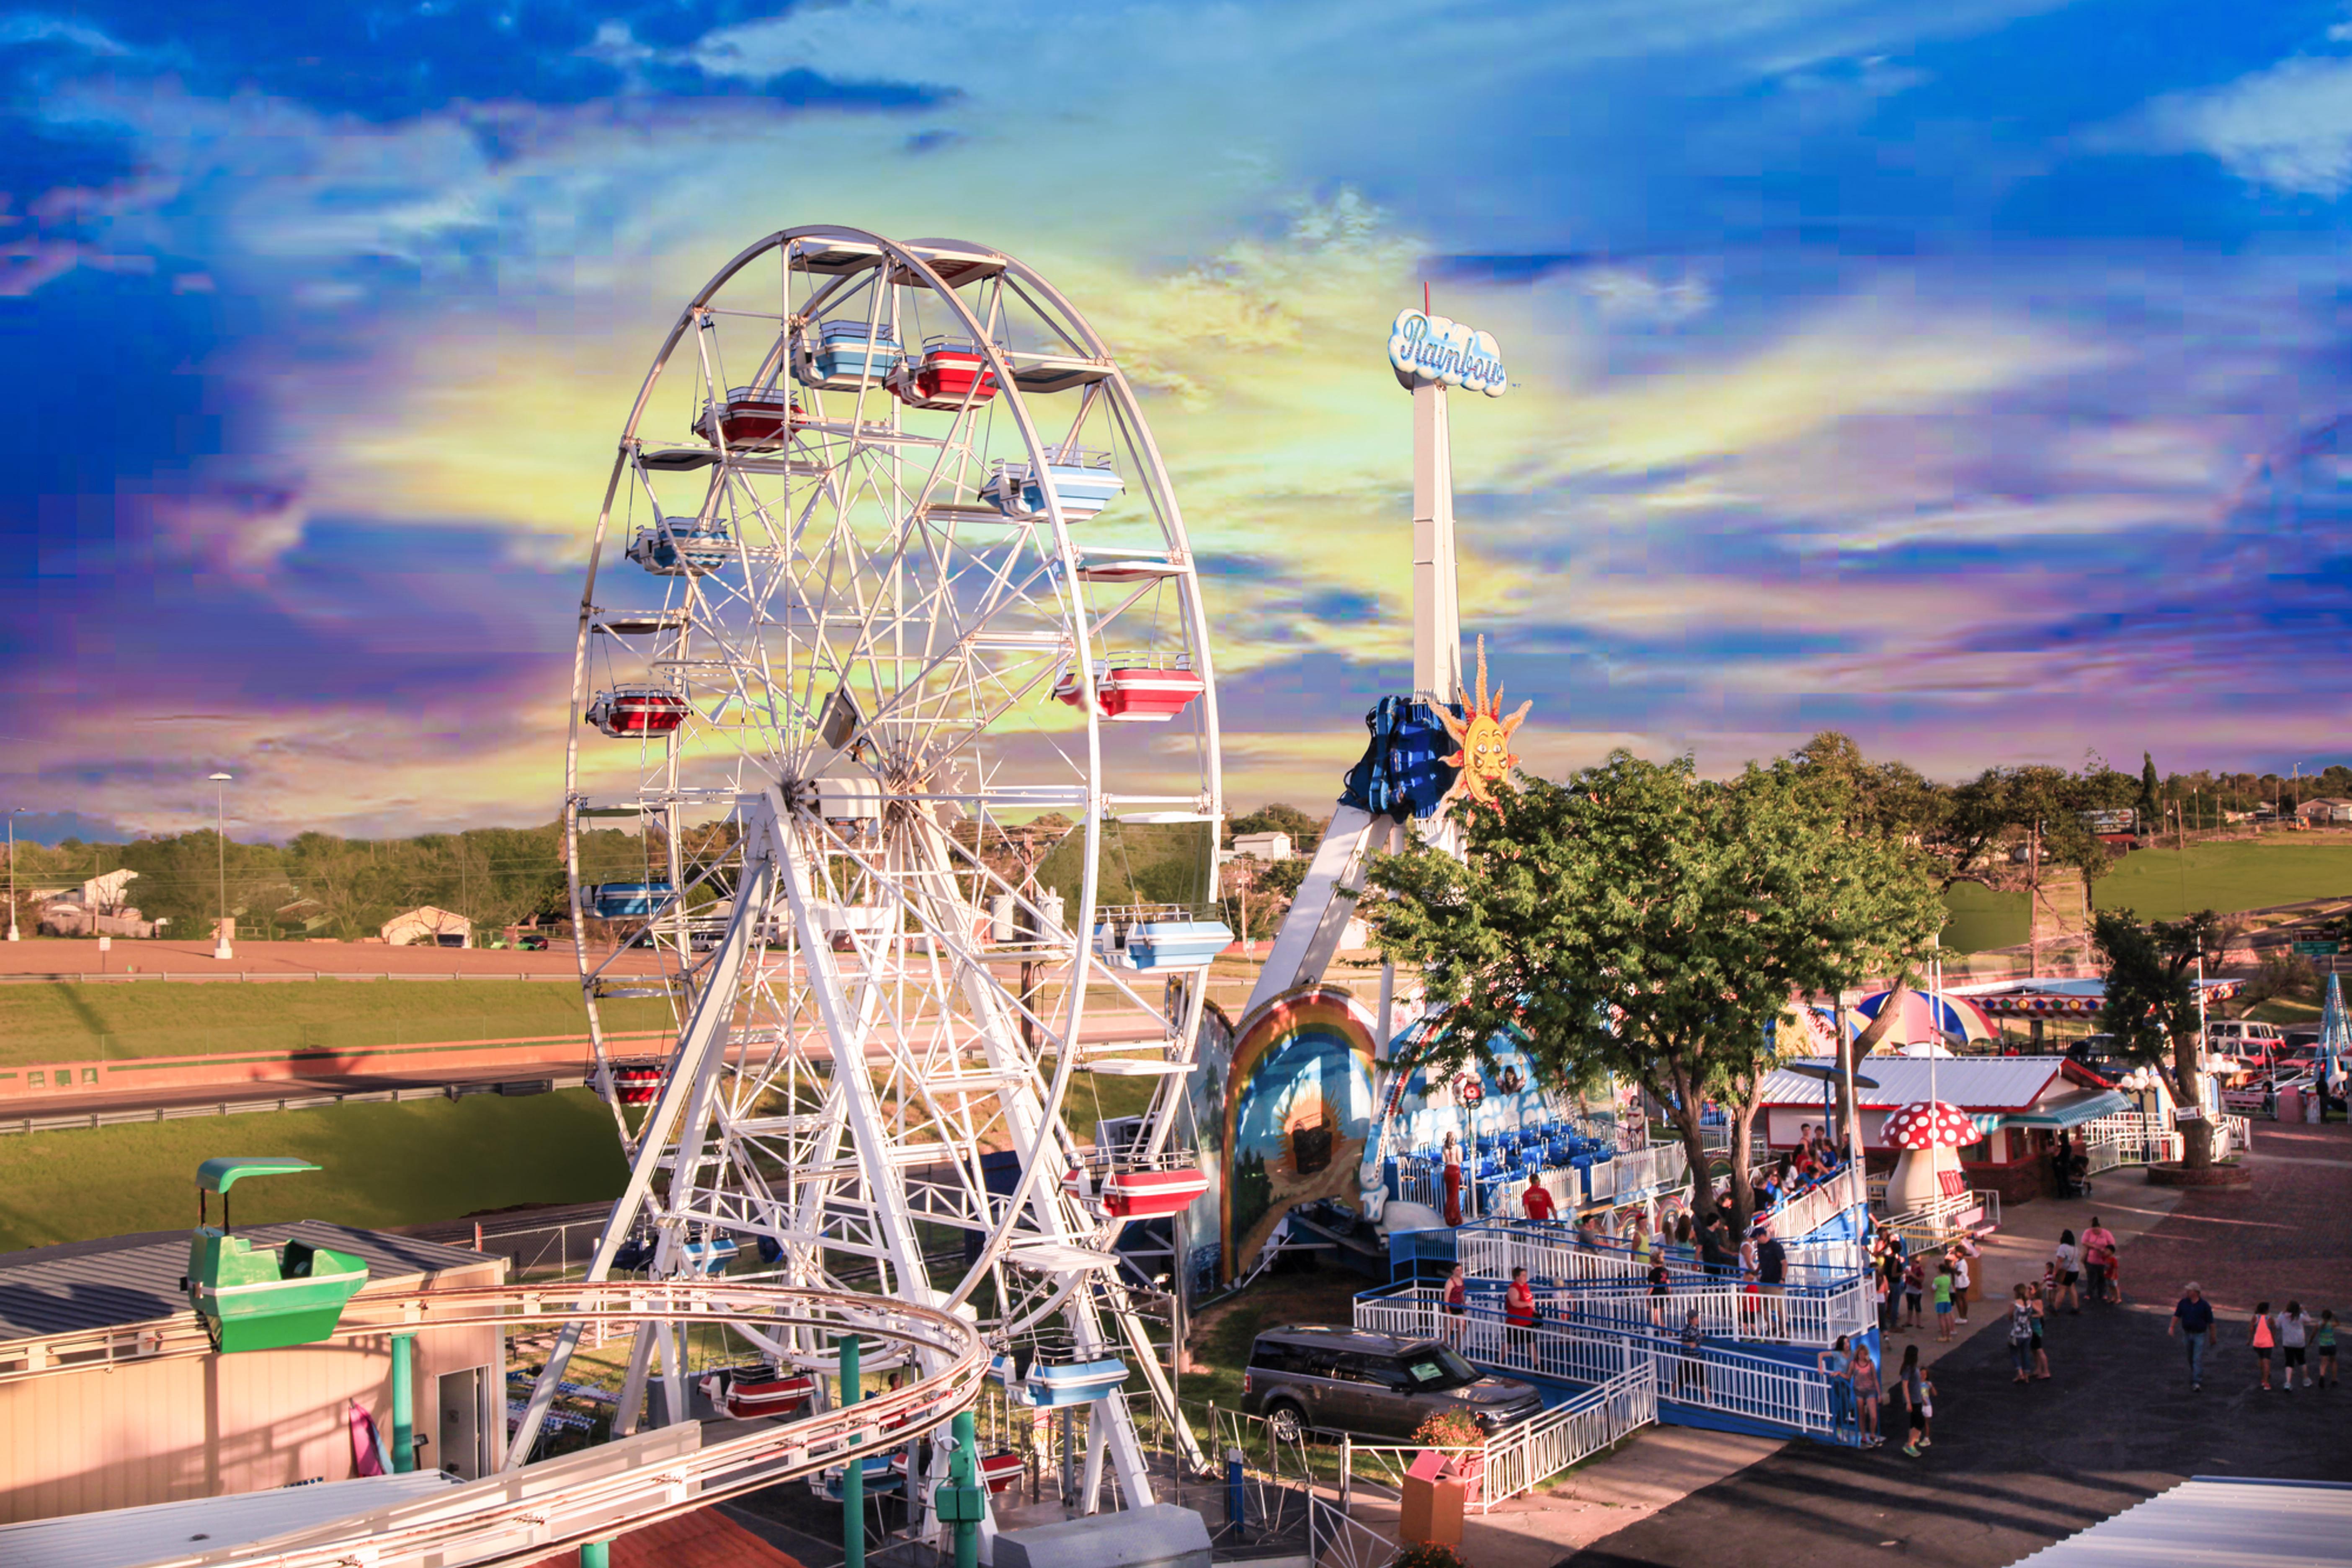 Wonderland Park Calendar, Hours & Pricing